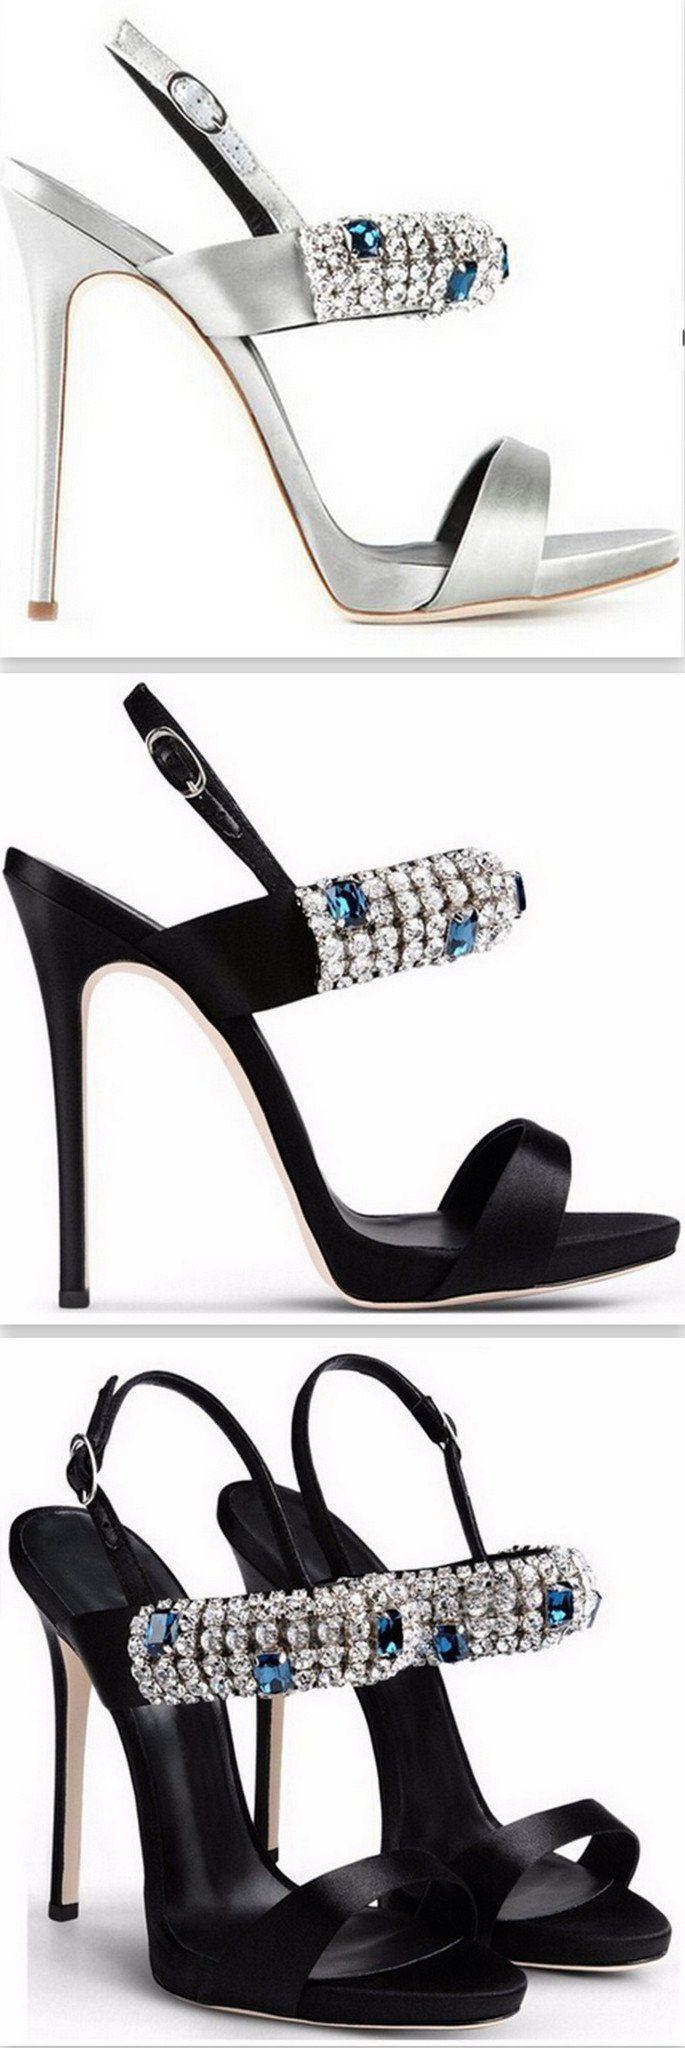 Jeweled Strap Sandals in Silver or Black #giuseppezanottiheelssilver